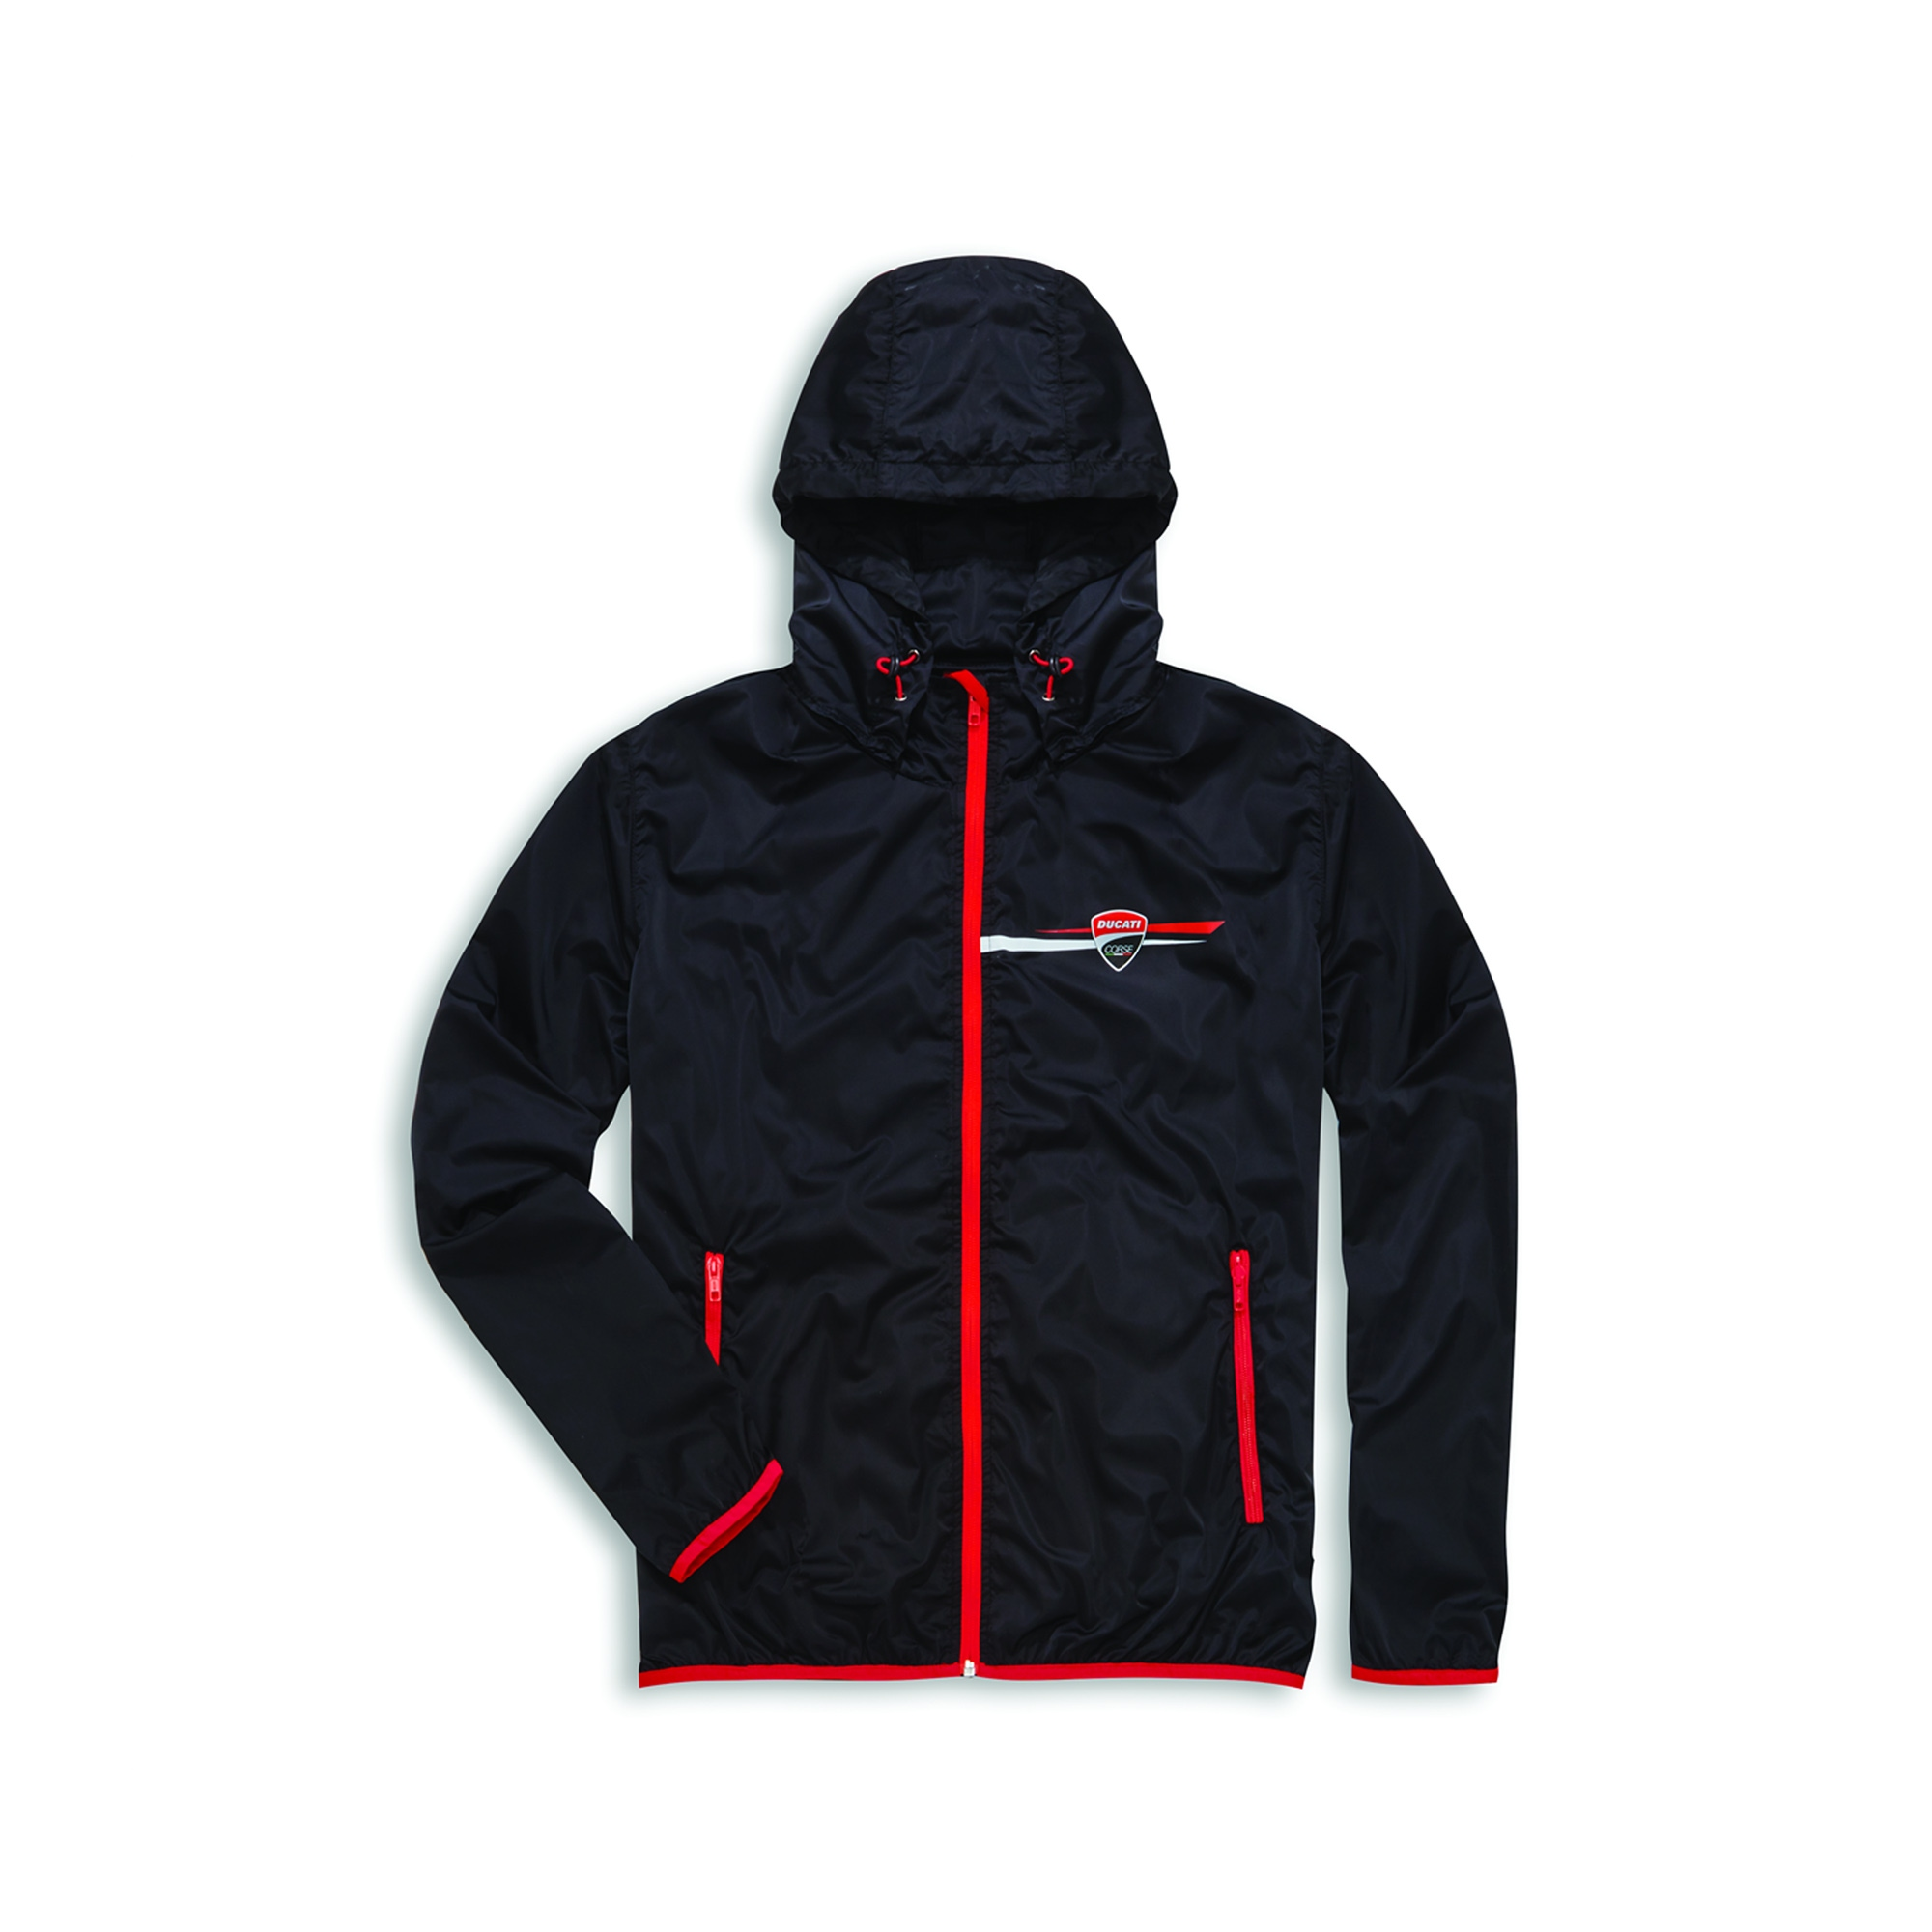 68396902dbc4 Rain Jacket Ducati Corse Stripe